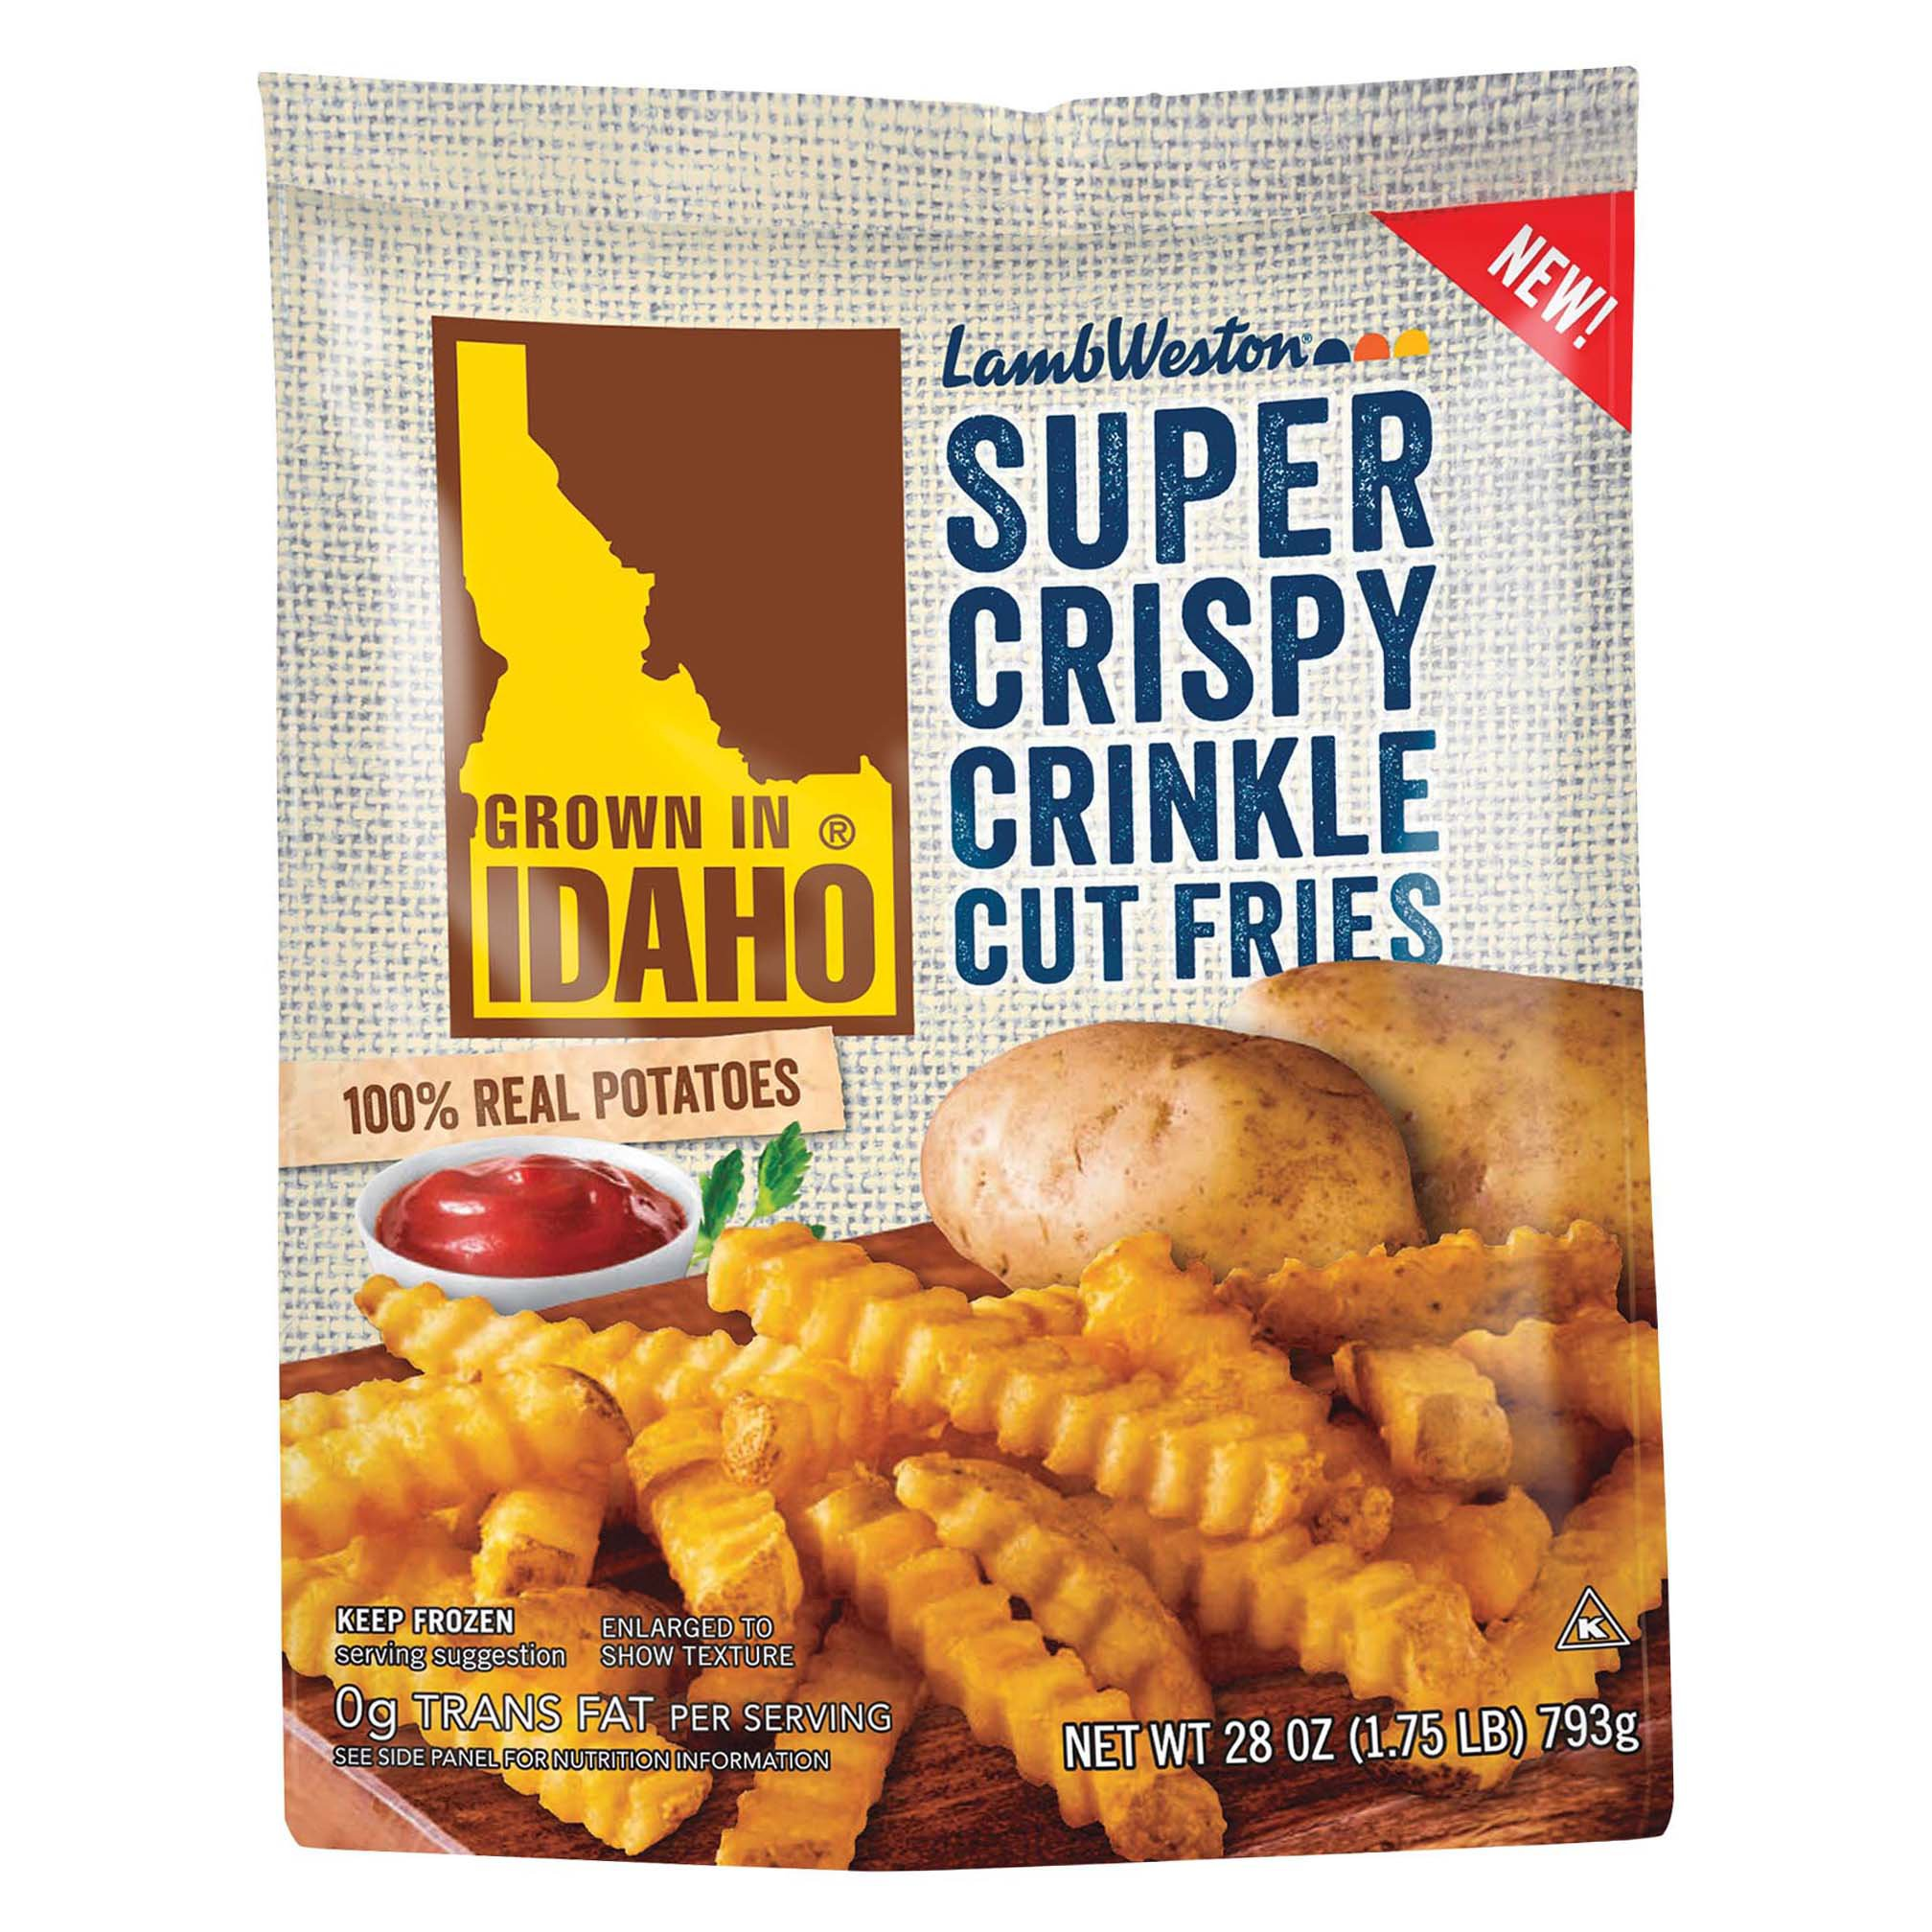 Idaho Super Crispy Crinkle Cut Fries